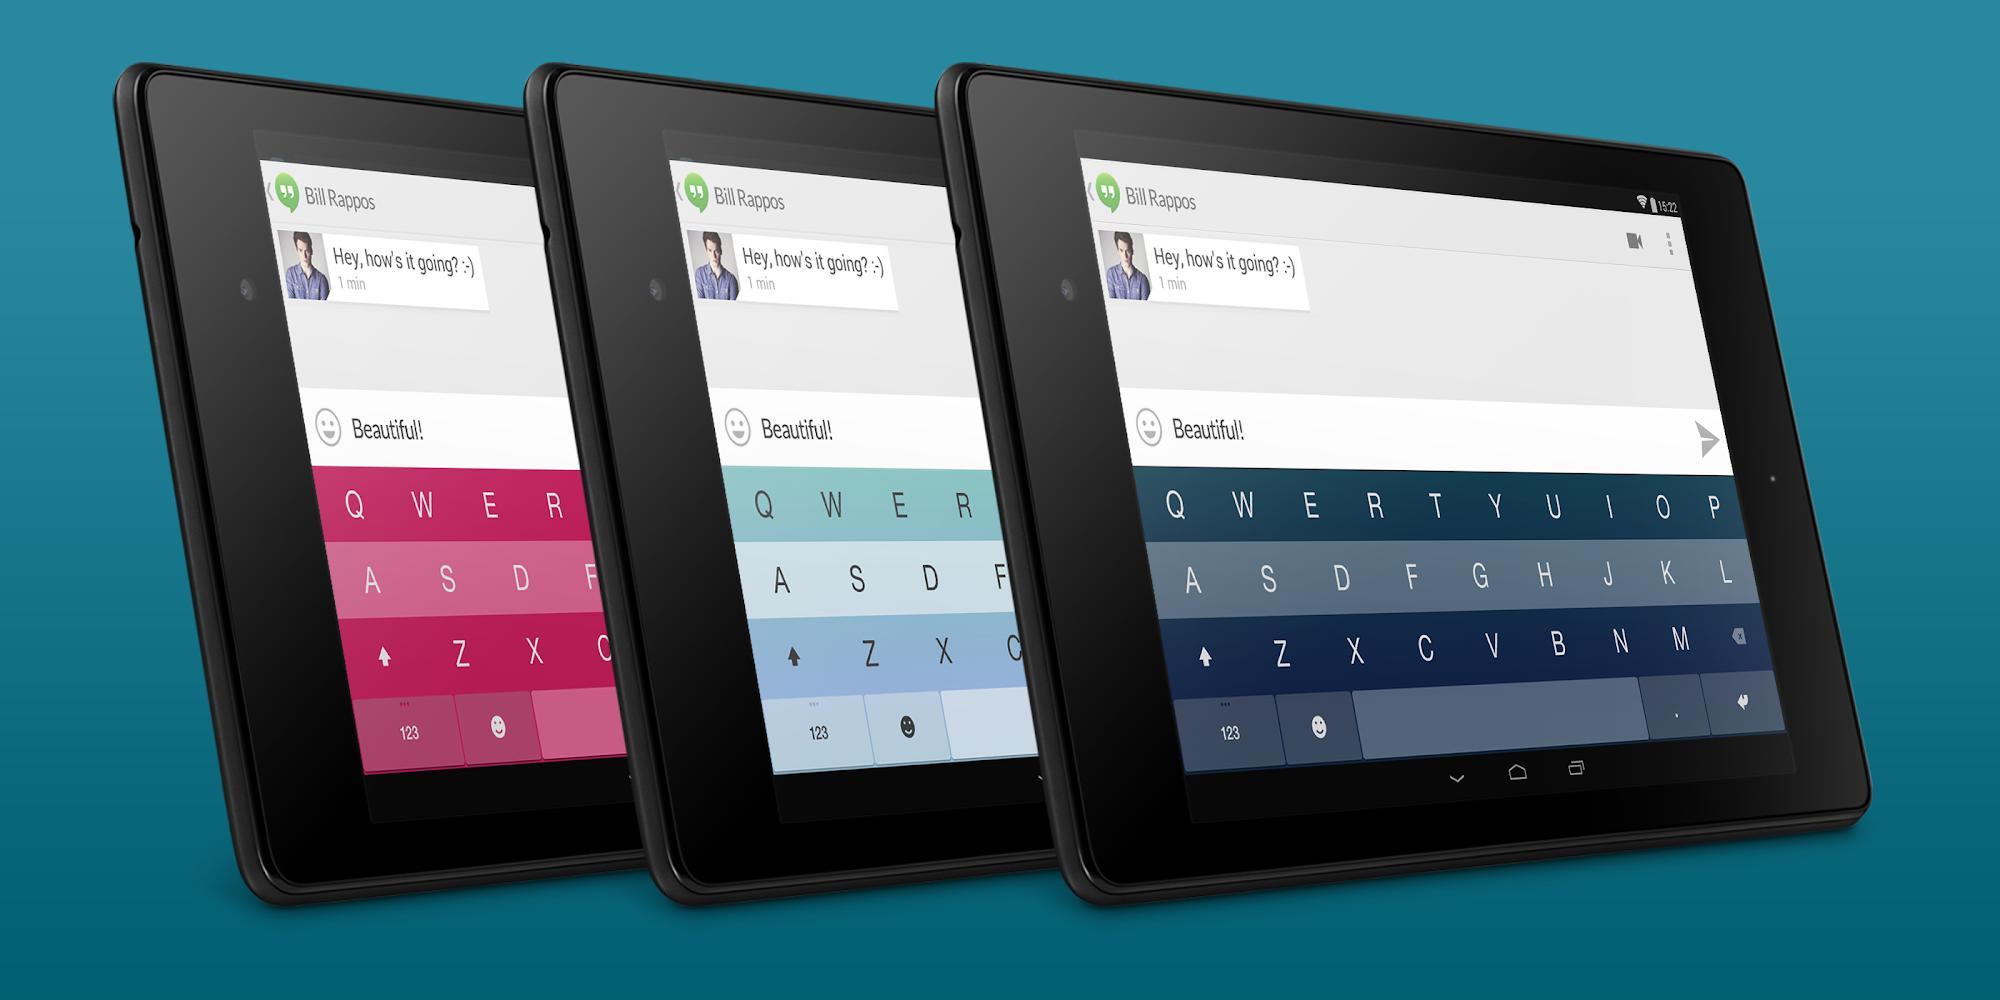 Fleksy + GIF Keyboard screenshot #23